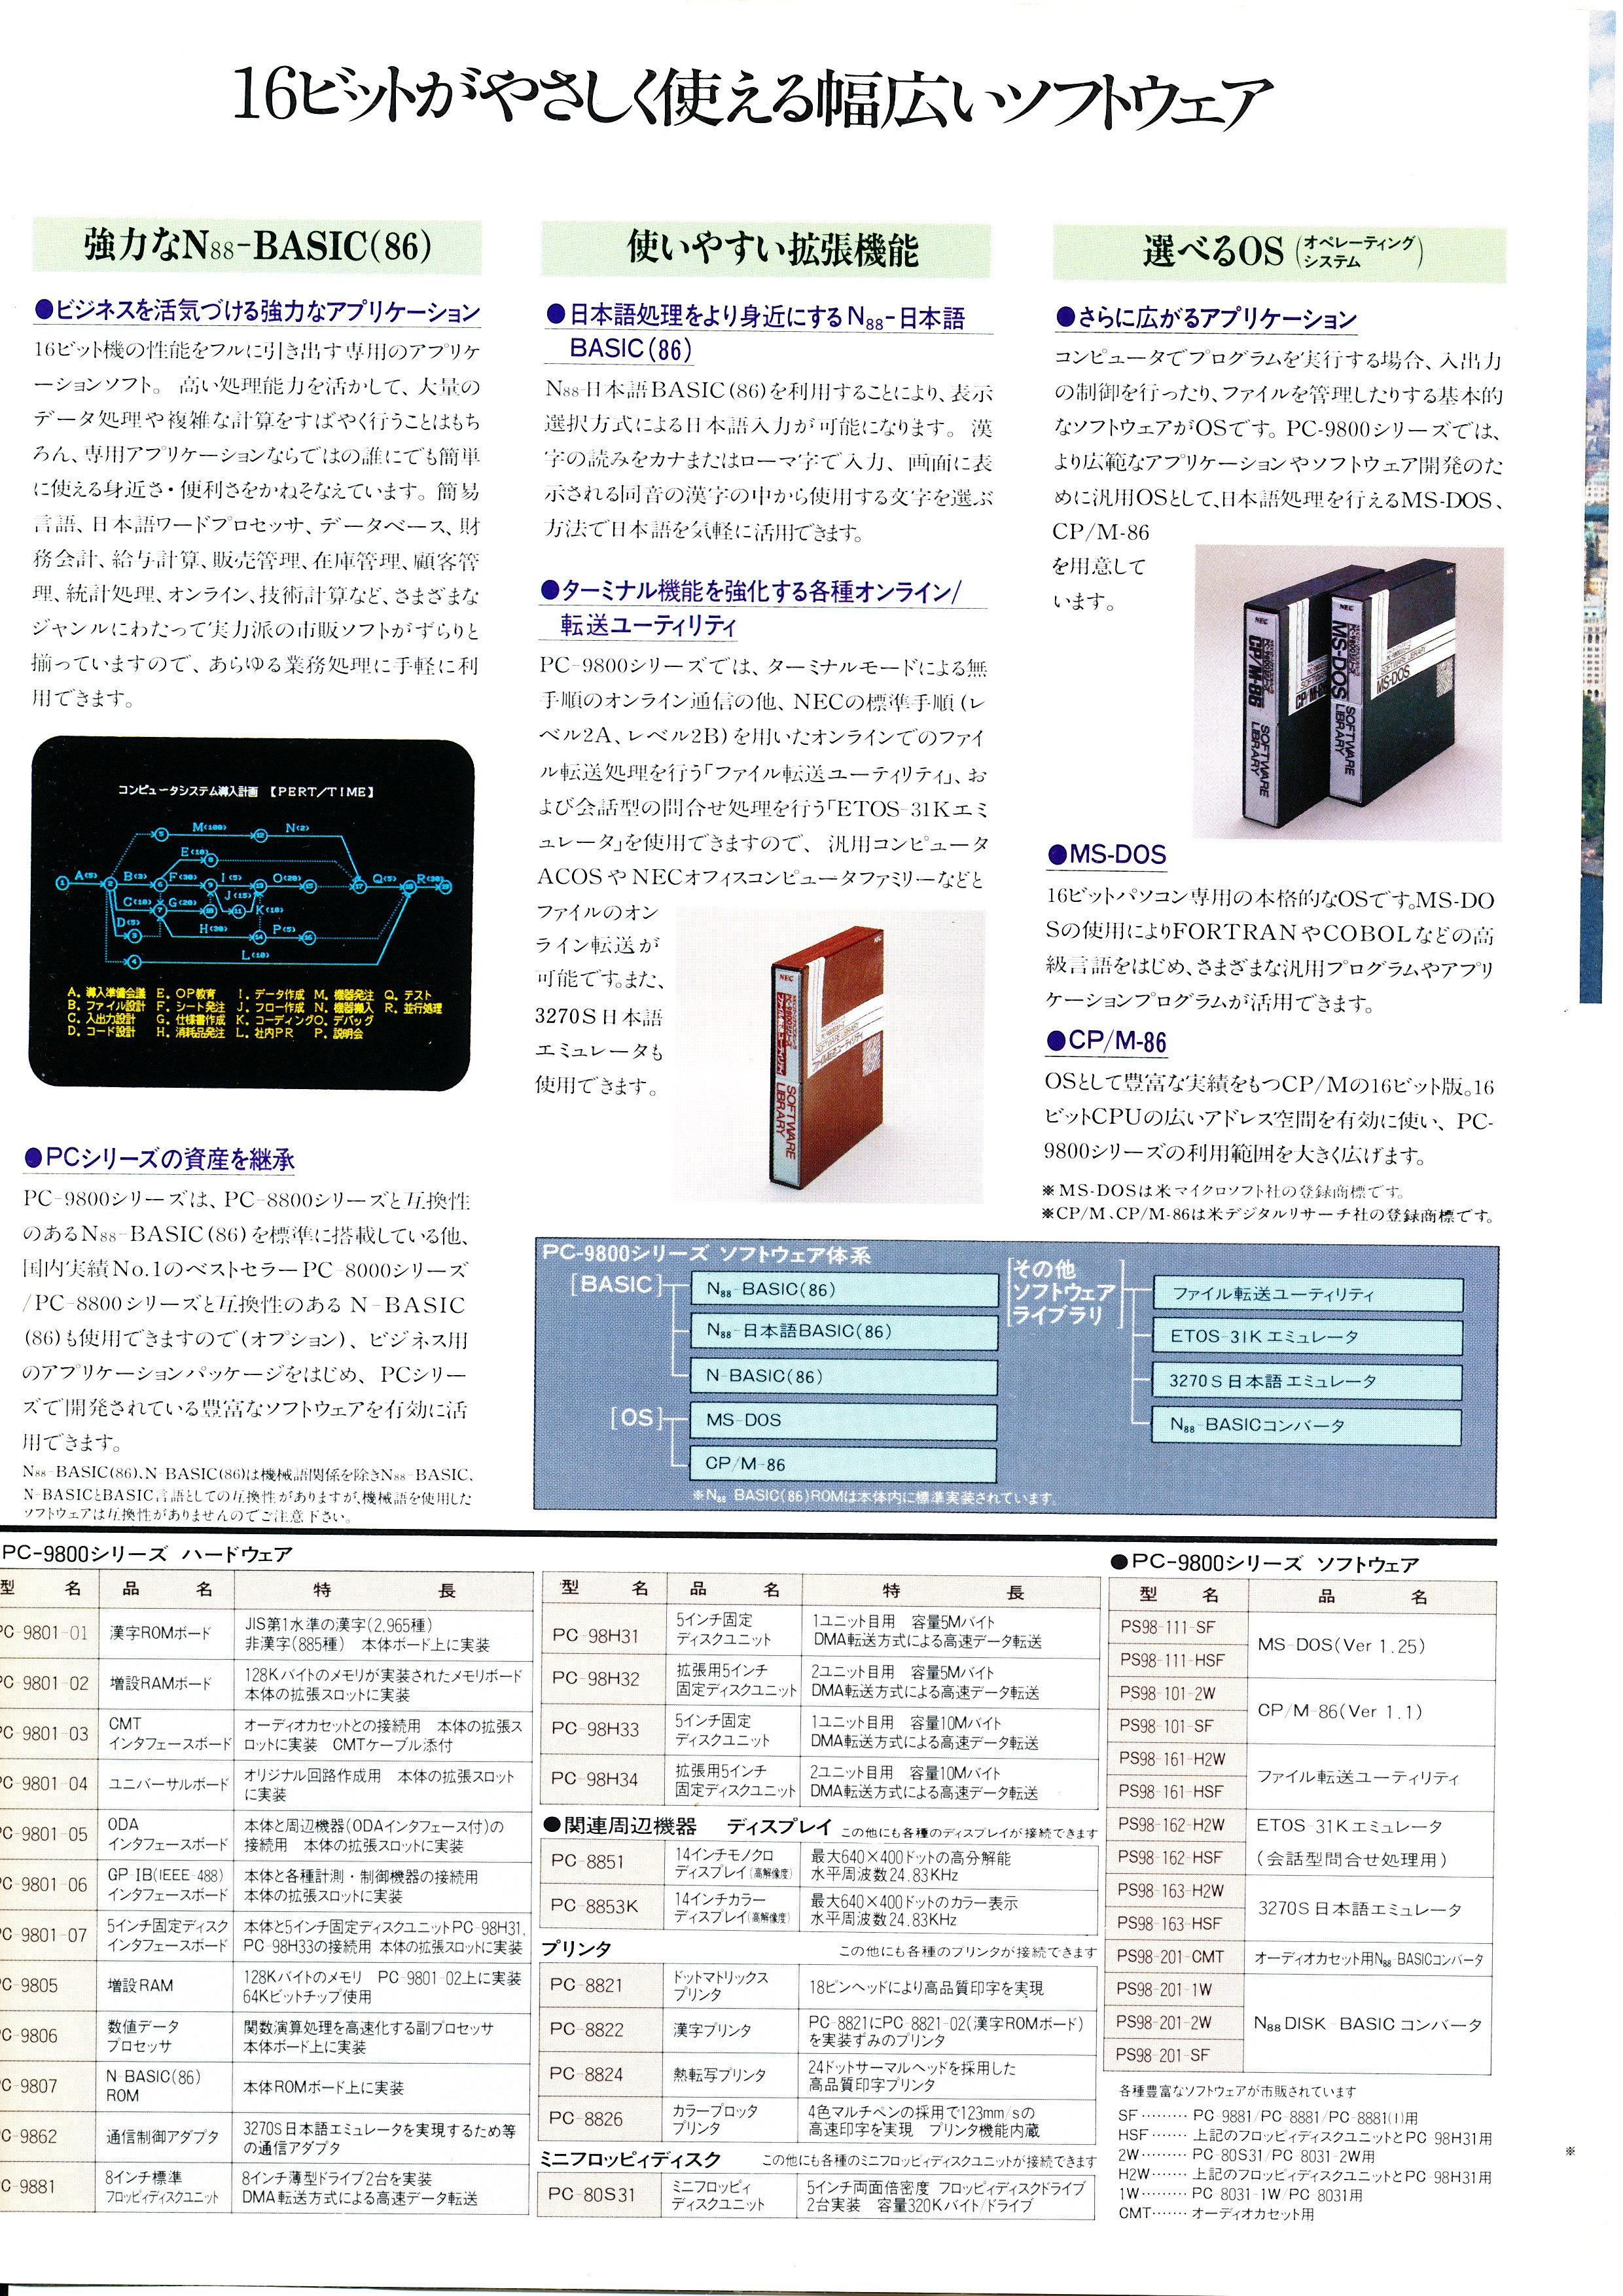 PC-9801 P5